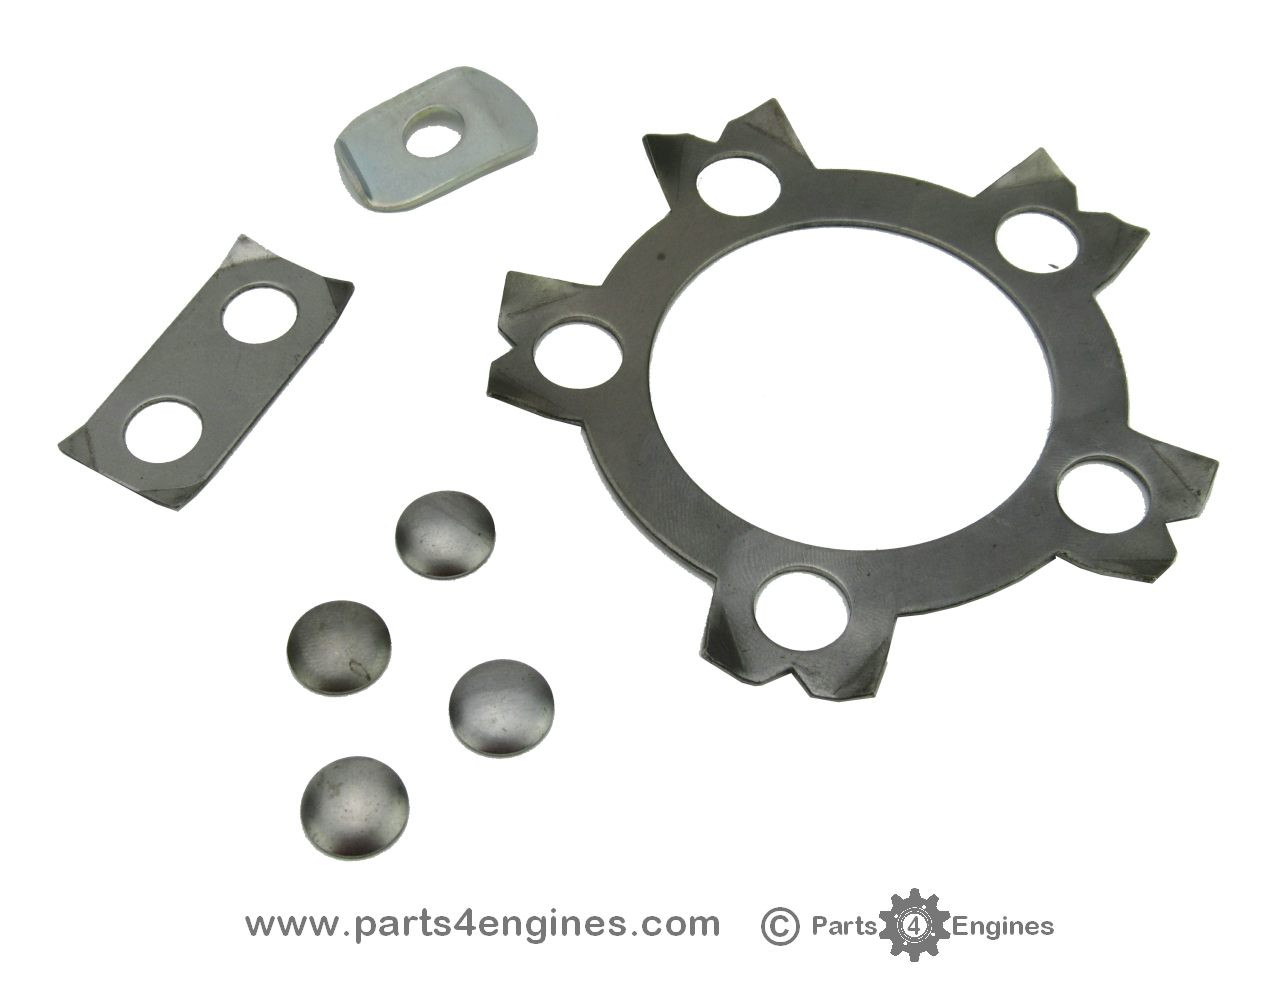 Perkins 4.108 Engine Overhaul Kit tab washer kit